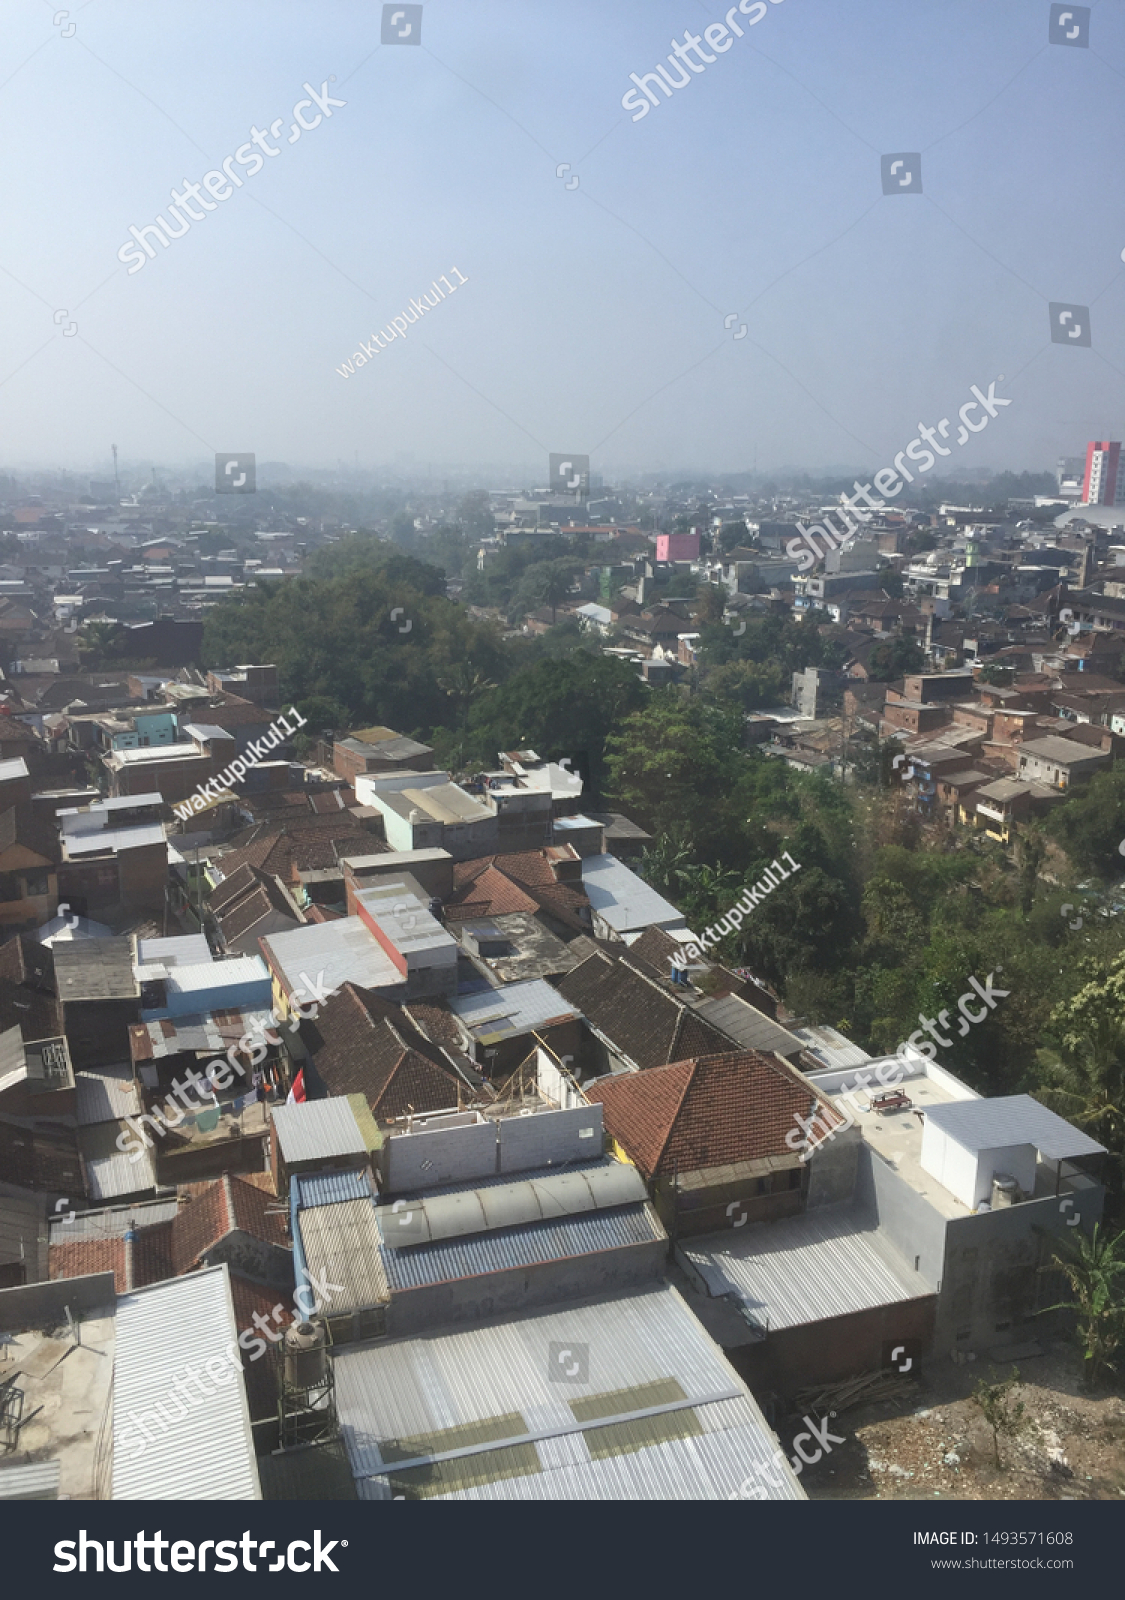 September 1 2019 Malang City Indonesia Buildings Landmarks Stock Image 1493571608